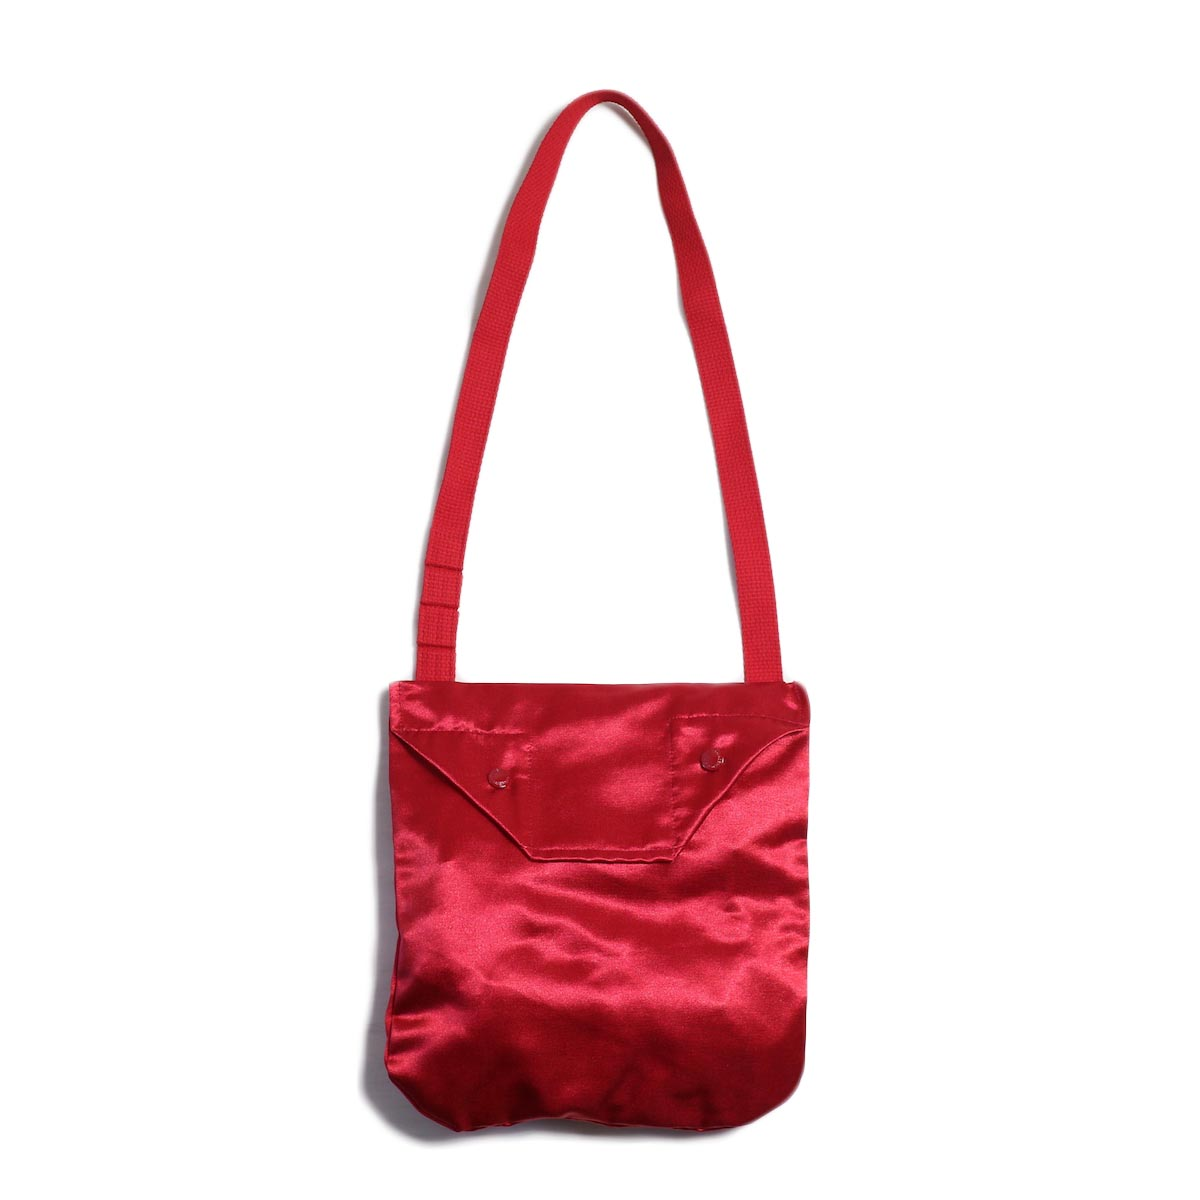 Engineered Garments / Shoulder Pouch - PC Kasha (Red)